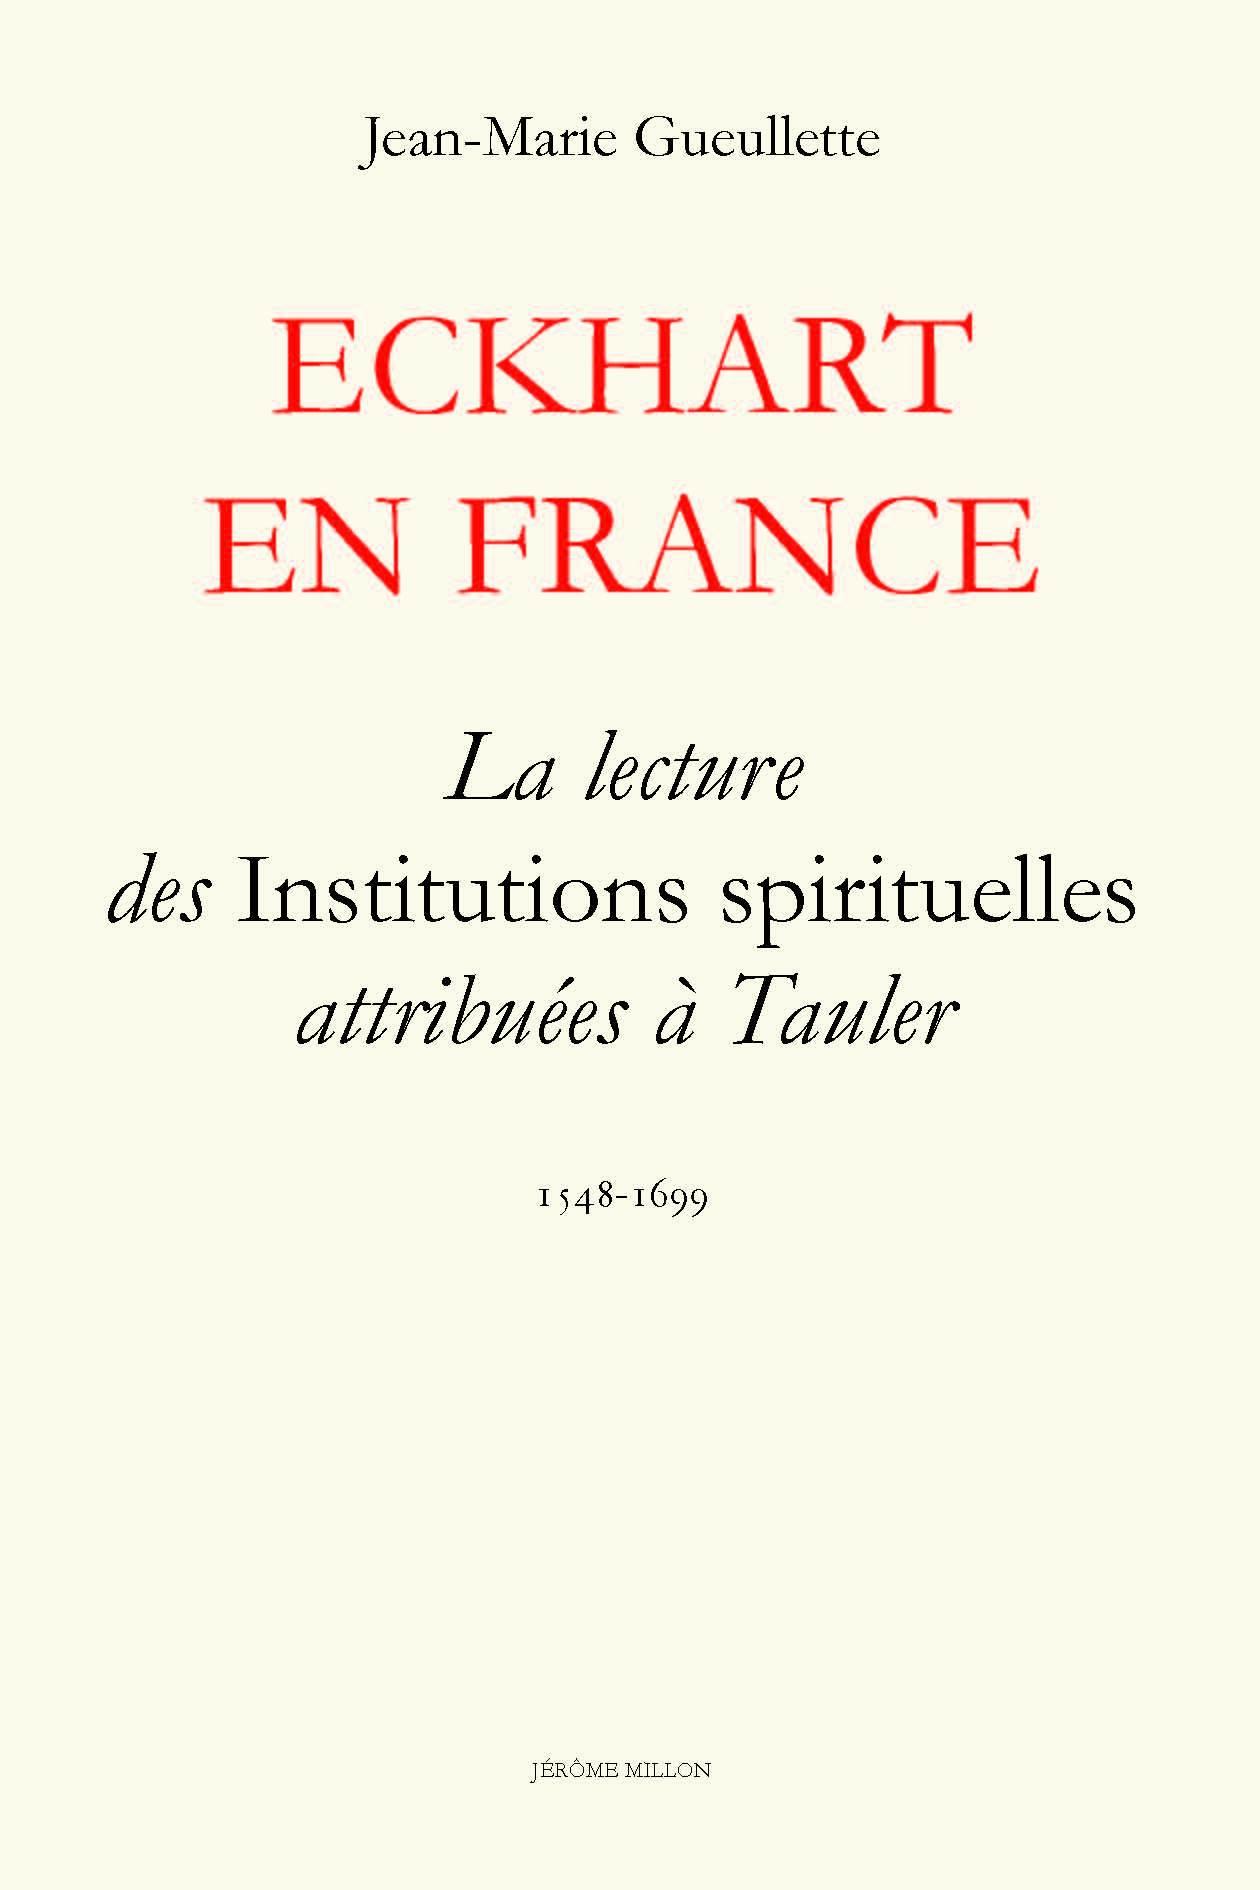 ECKHART EN FRANCE